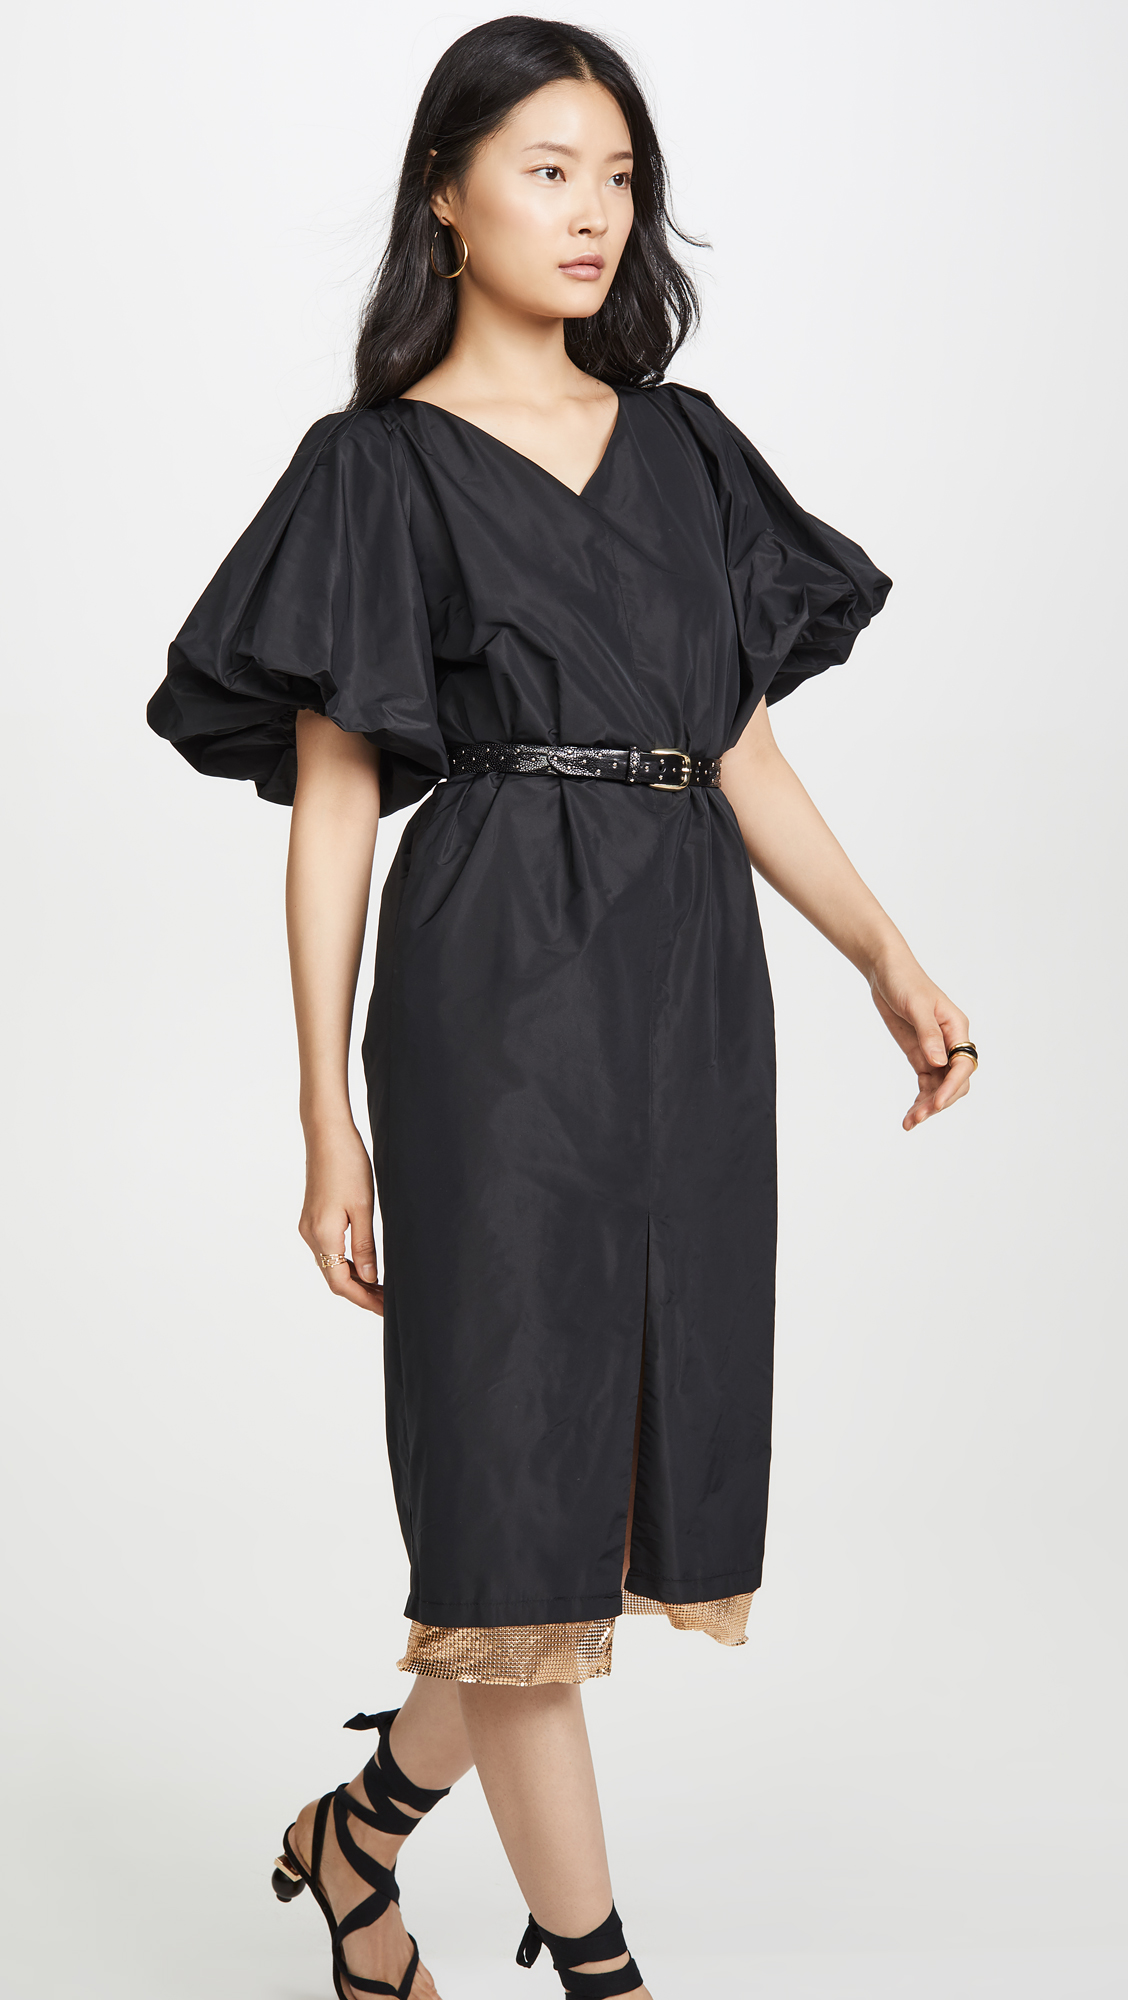 Rachel Comey Lurie dress in black taffeta